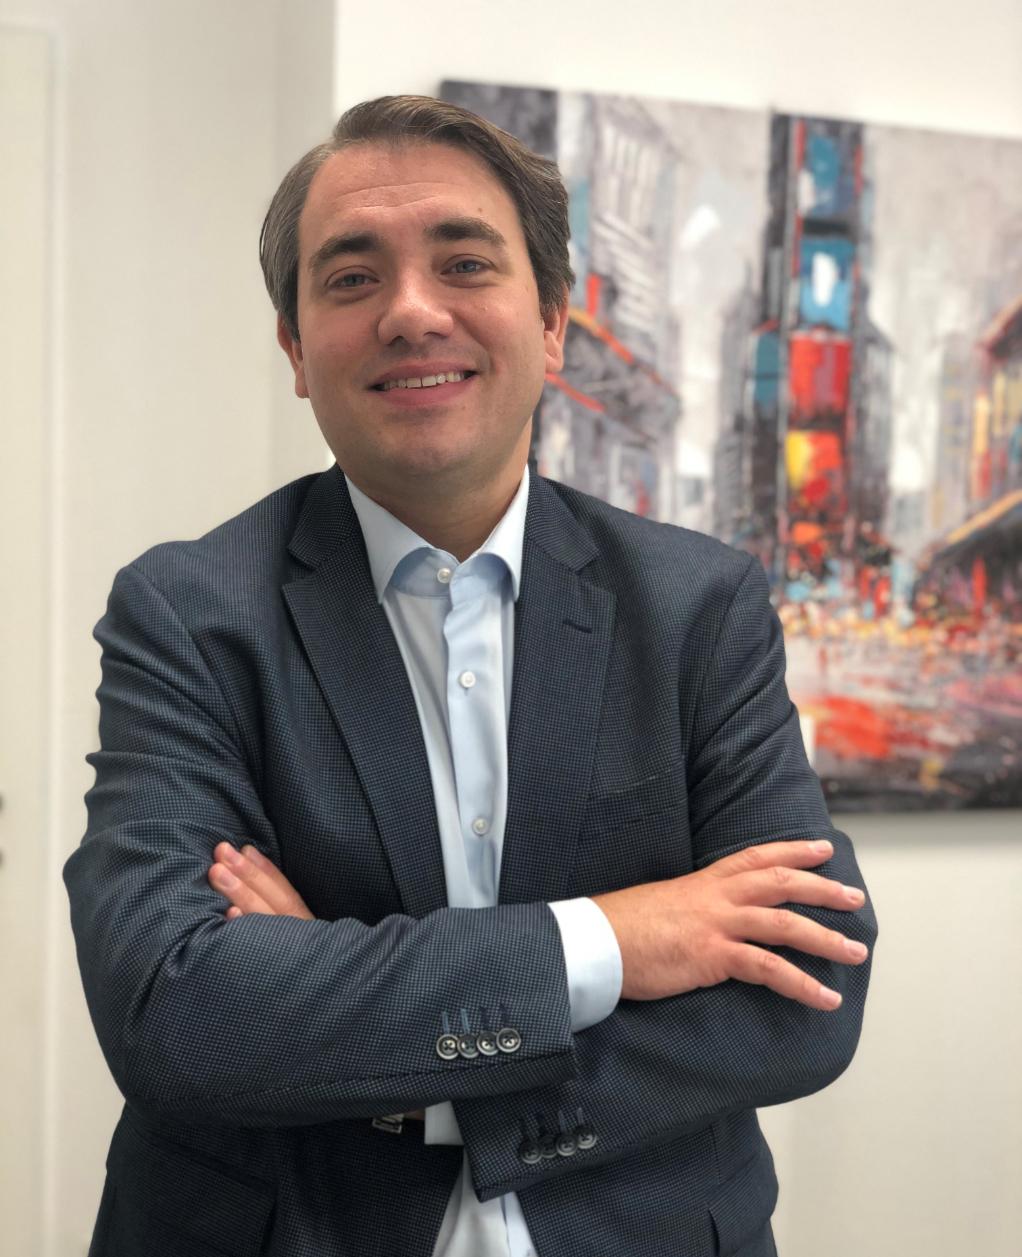 Prof. Dr. Frank Giordano